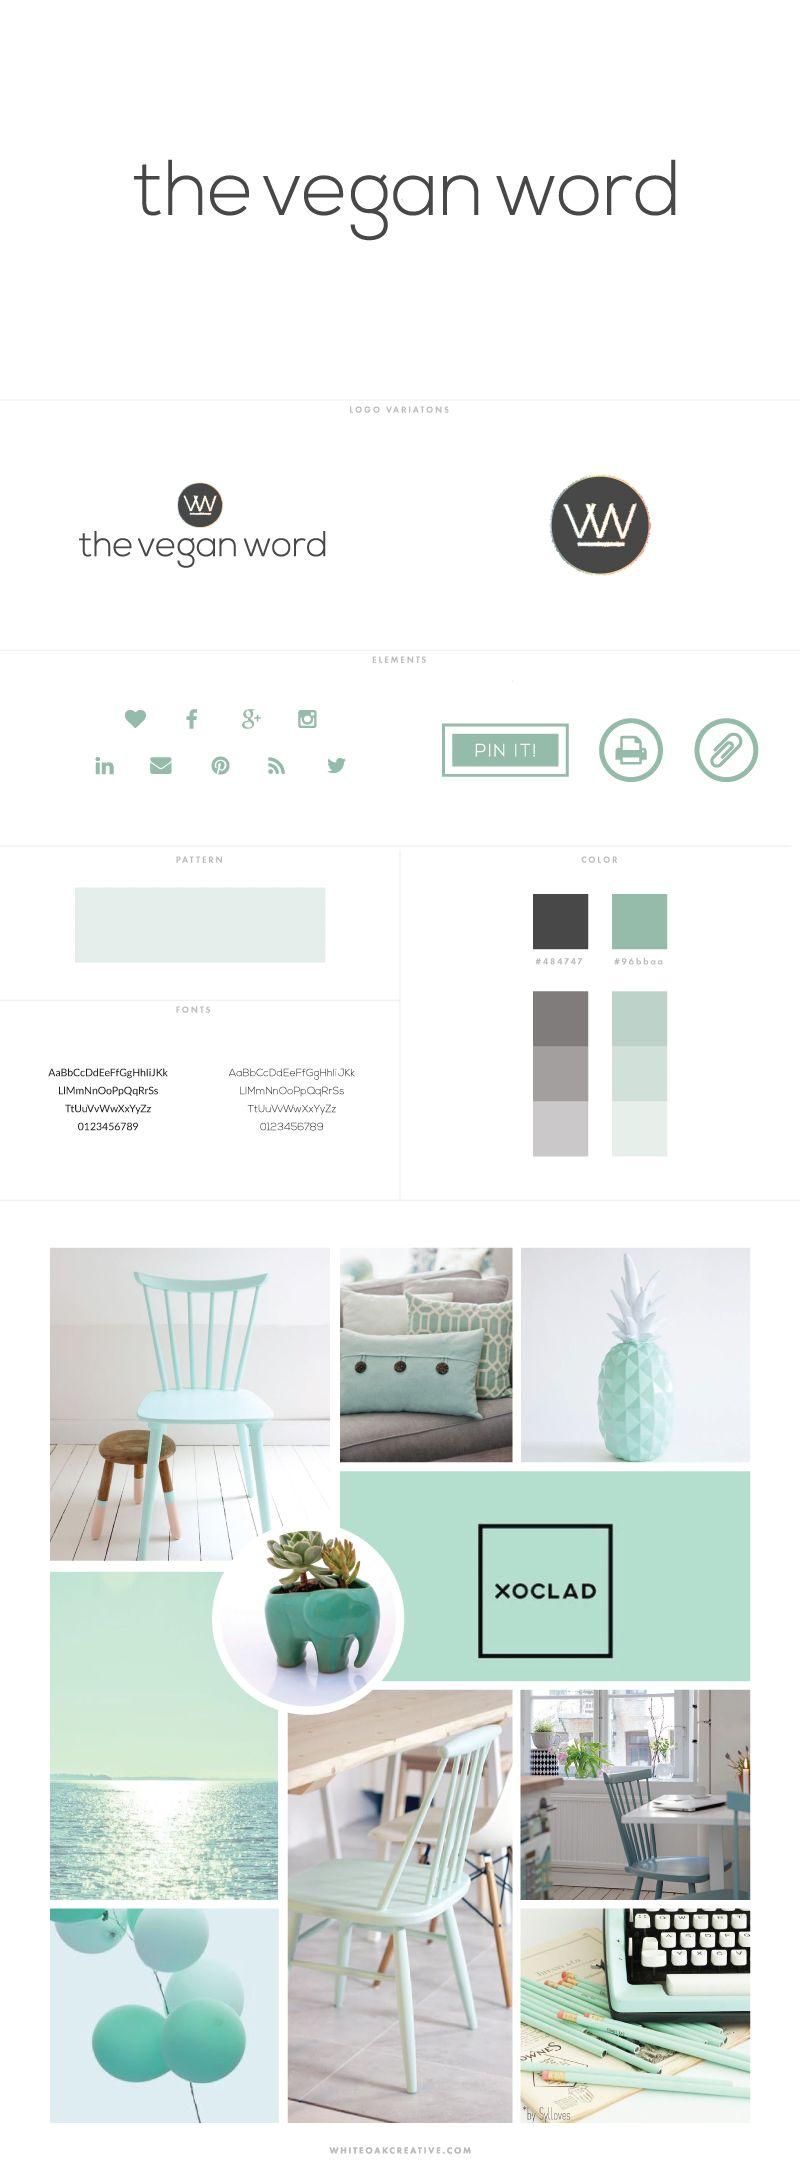 Custom Blog Design for The Vegan Word by White Oak Creative  - logo design, wordpress theme, mood board inspiration, blog design idea, graphic design, branding